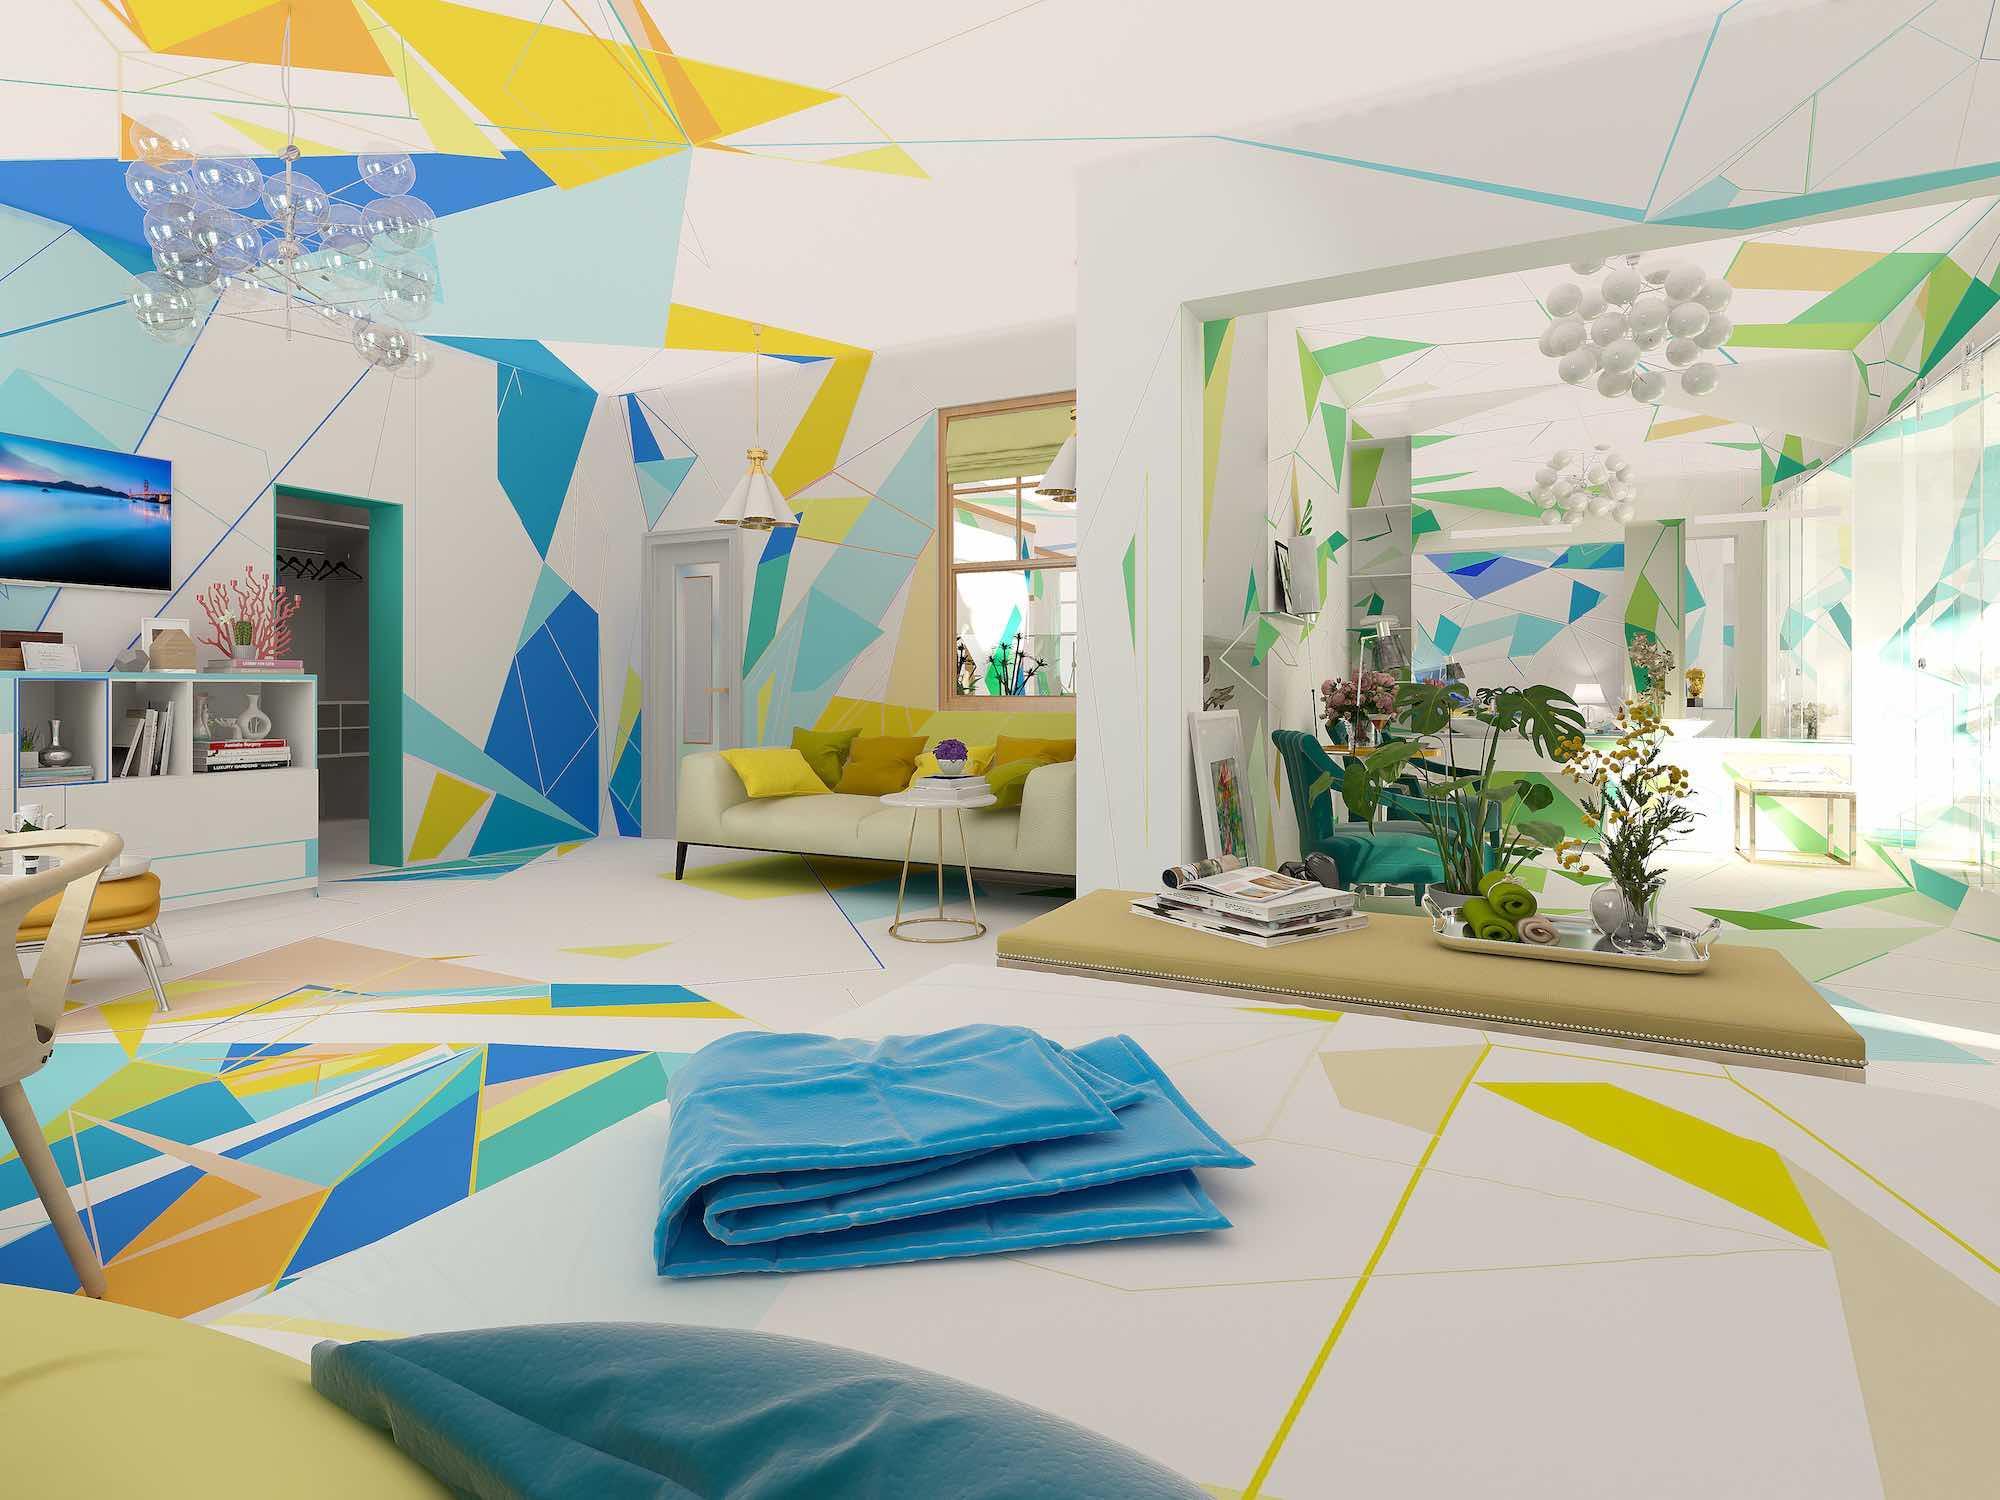 Garden of Impressionist designed by Brani & Desi